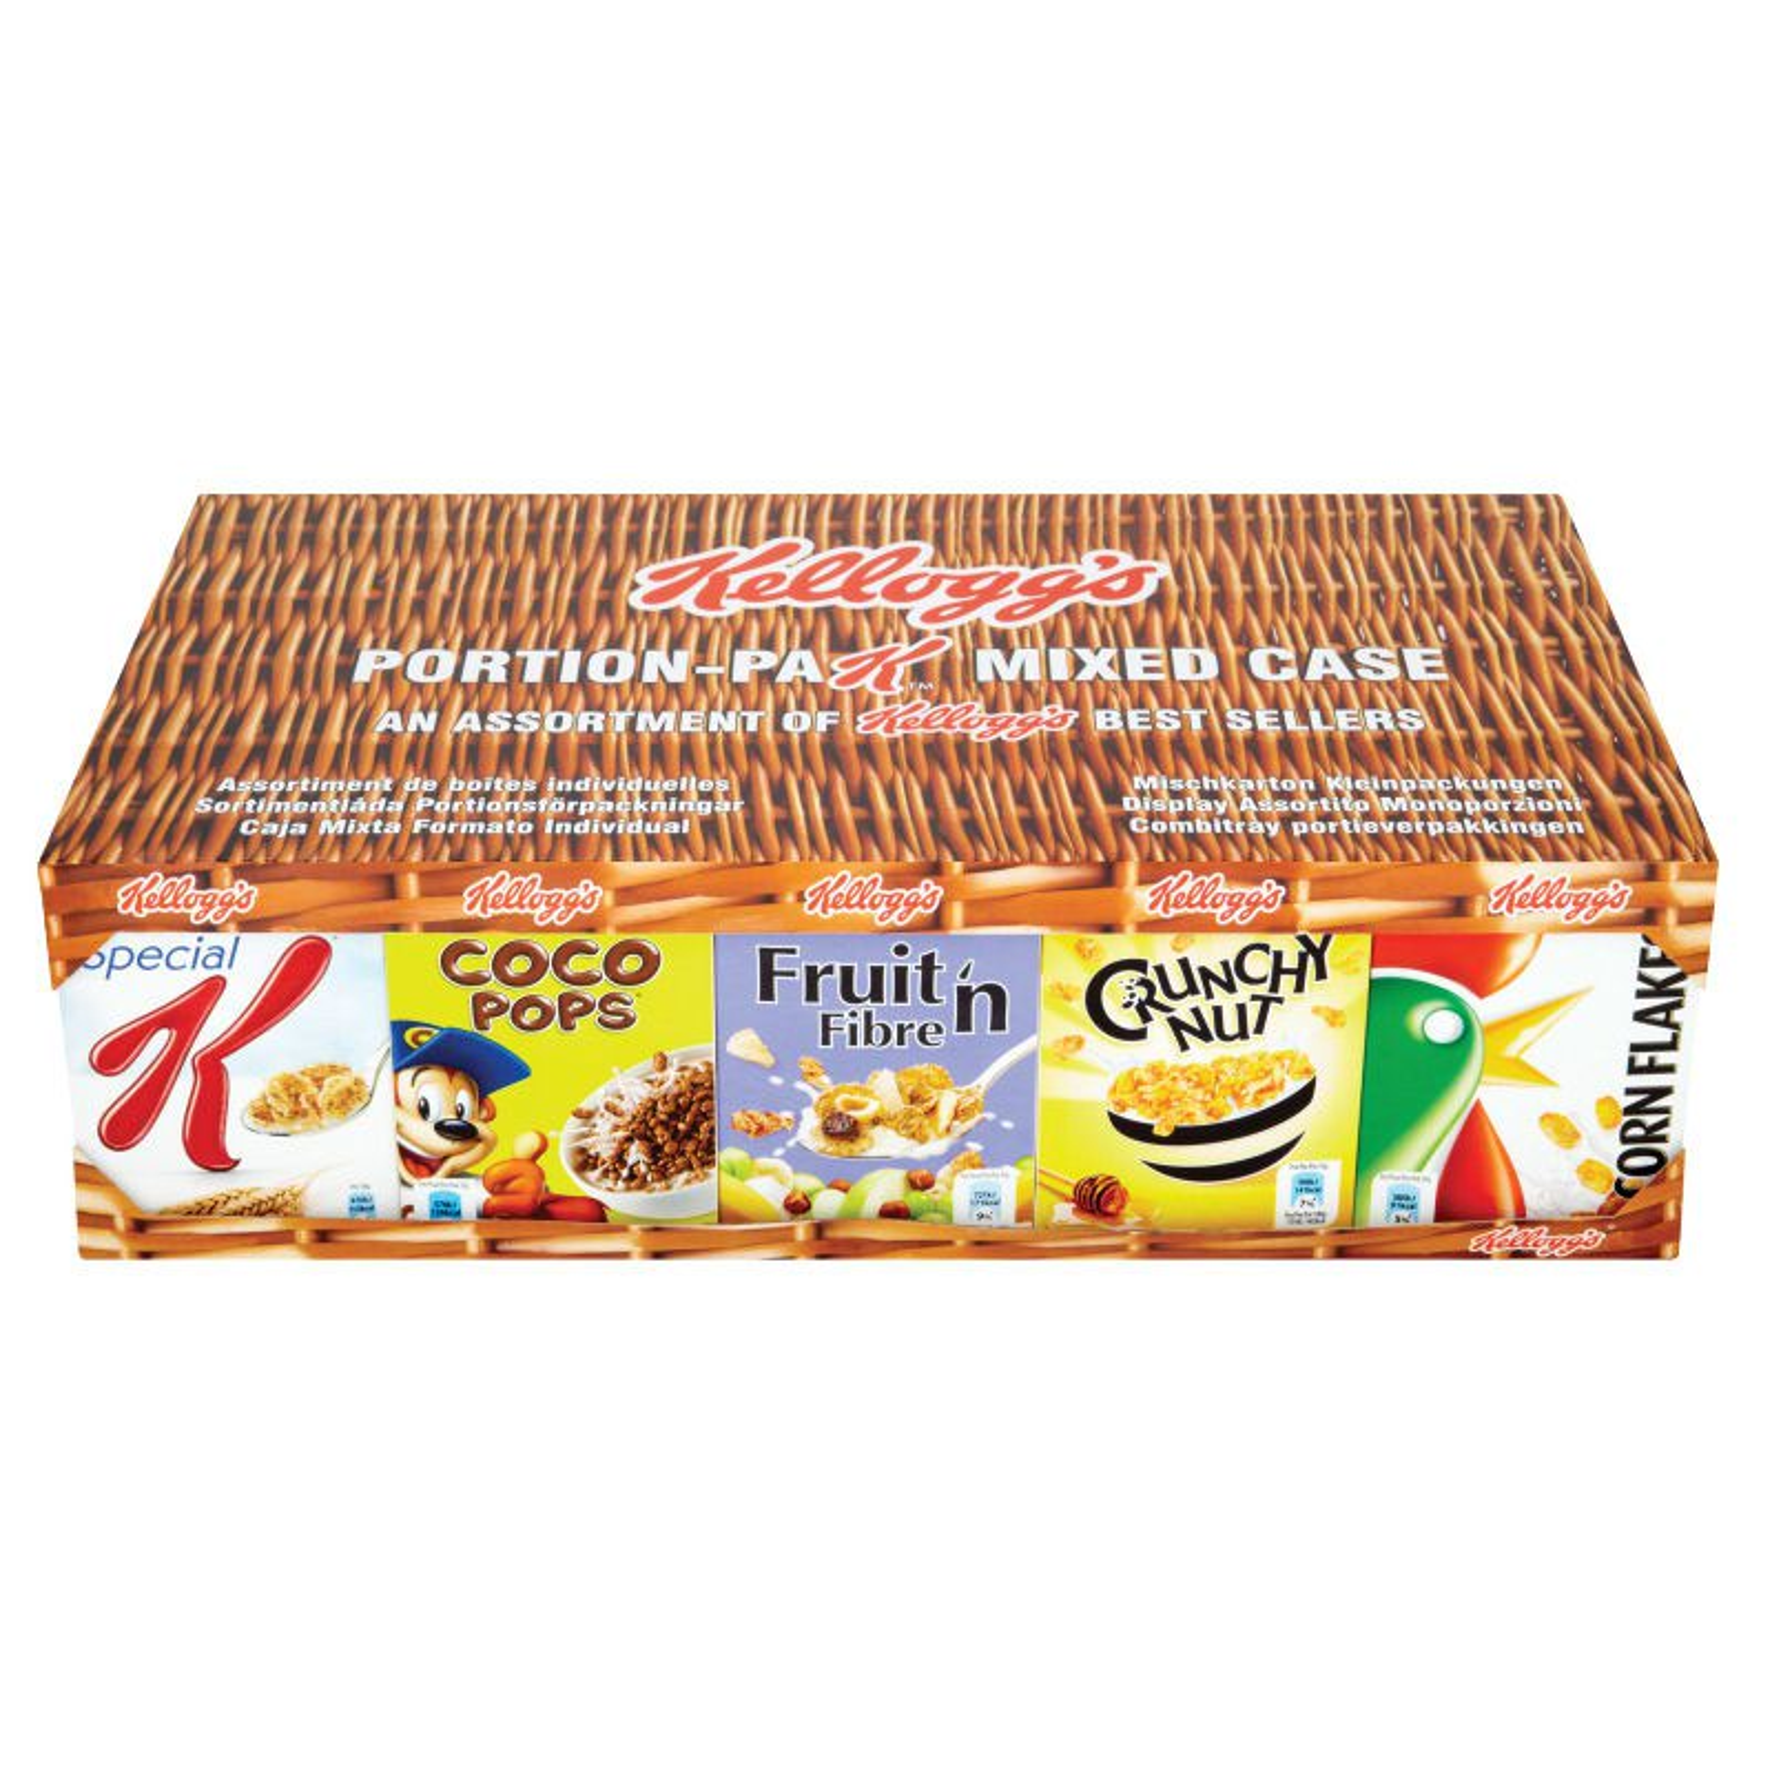 Mixed Case Portion Pack Cereals 7x5 Pks